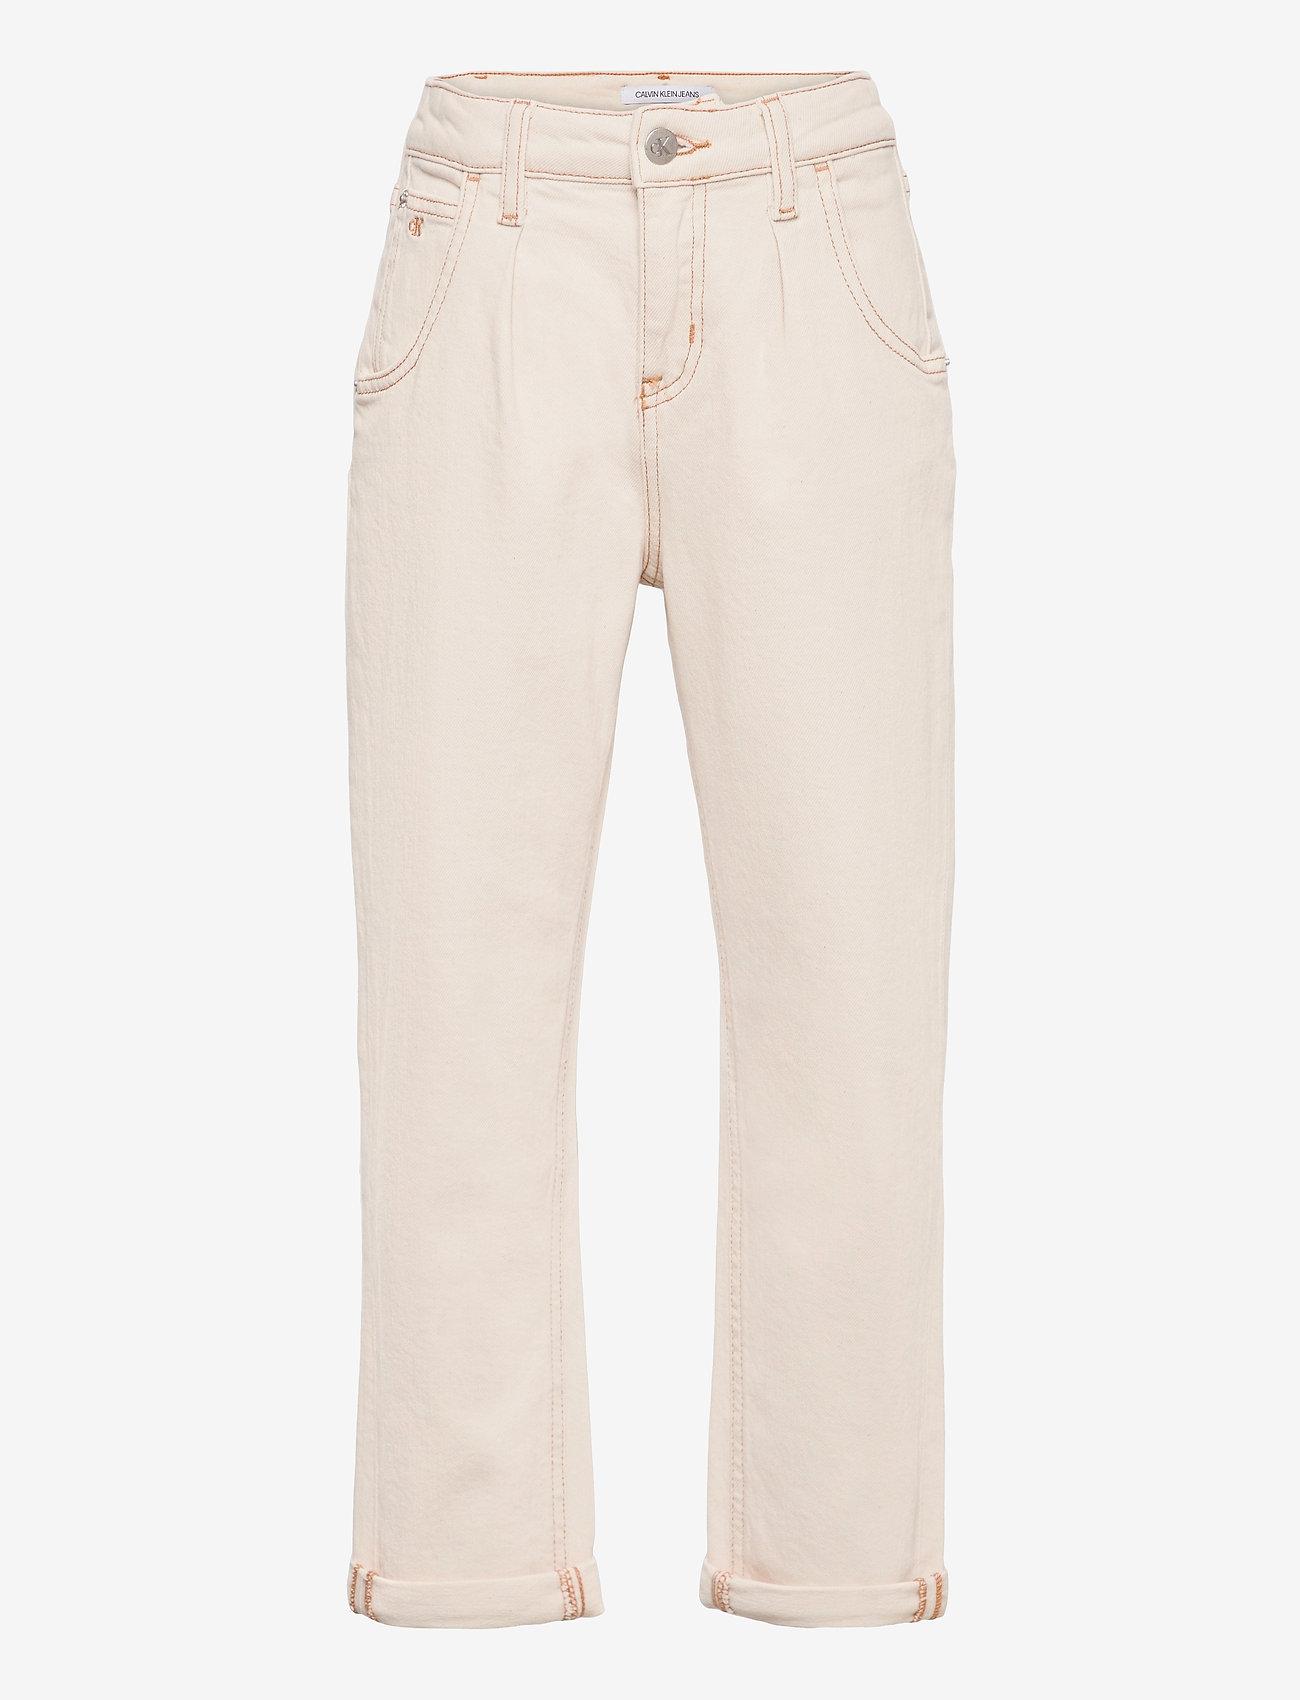 Calvin Klein - BARREL LEG ECRU NATURAL COM - jeans - ecru natural comfort - 0